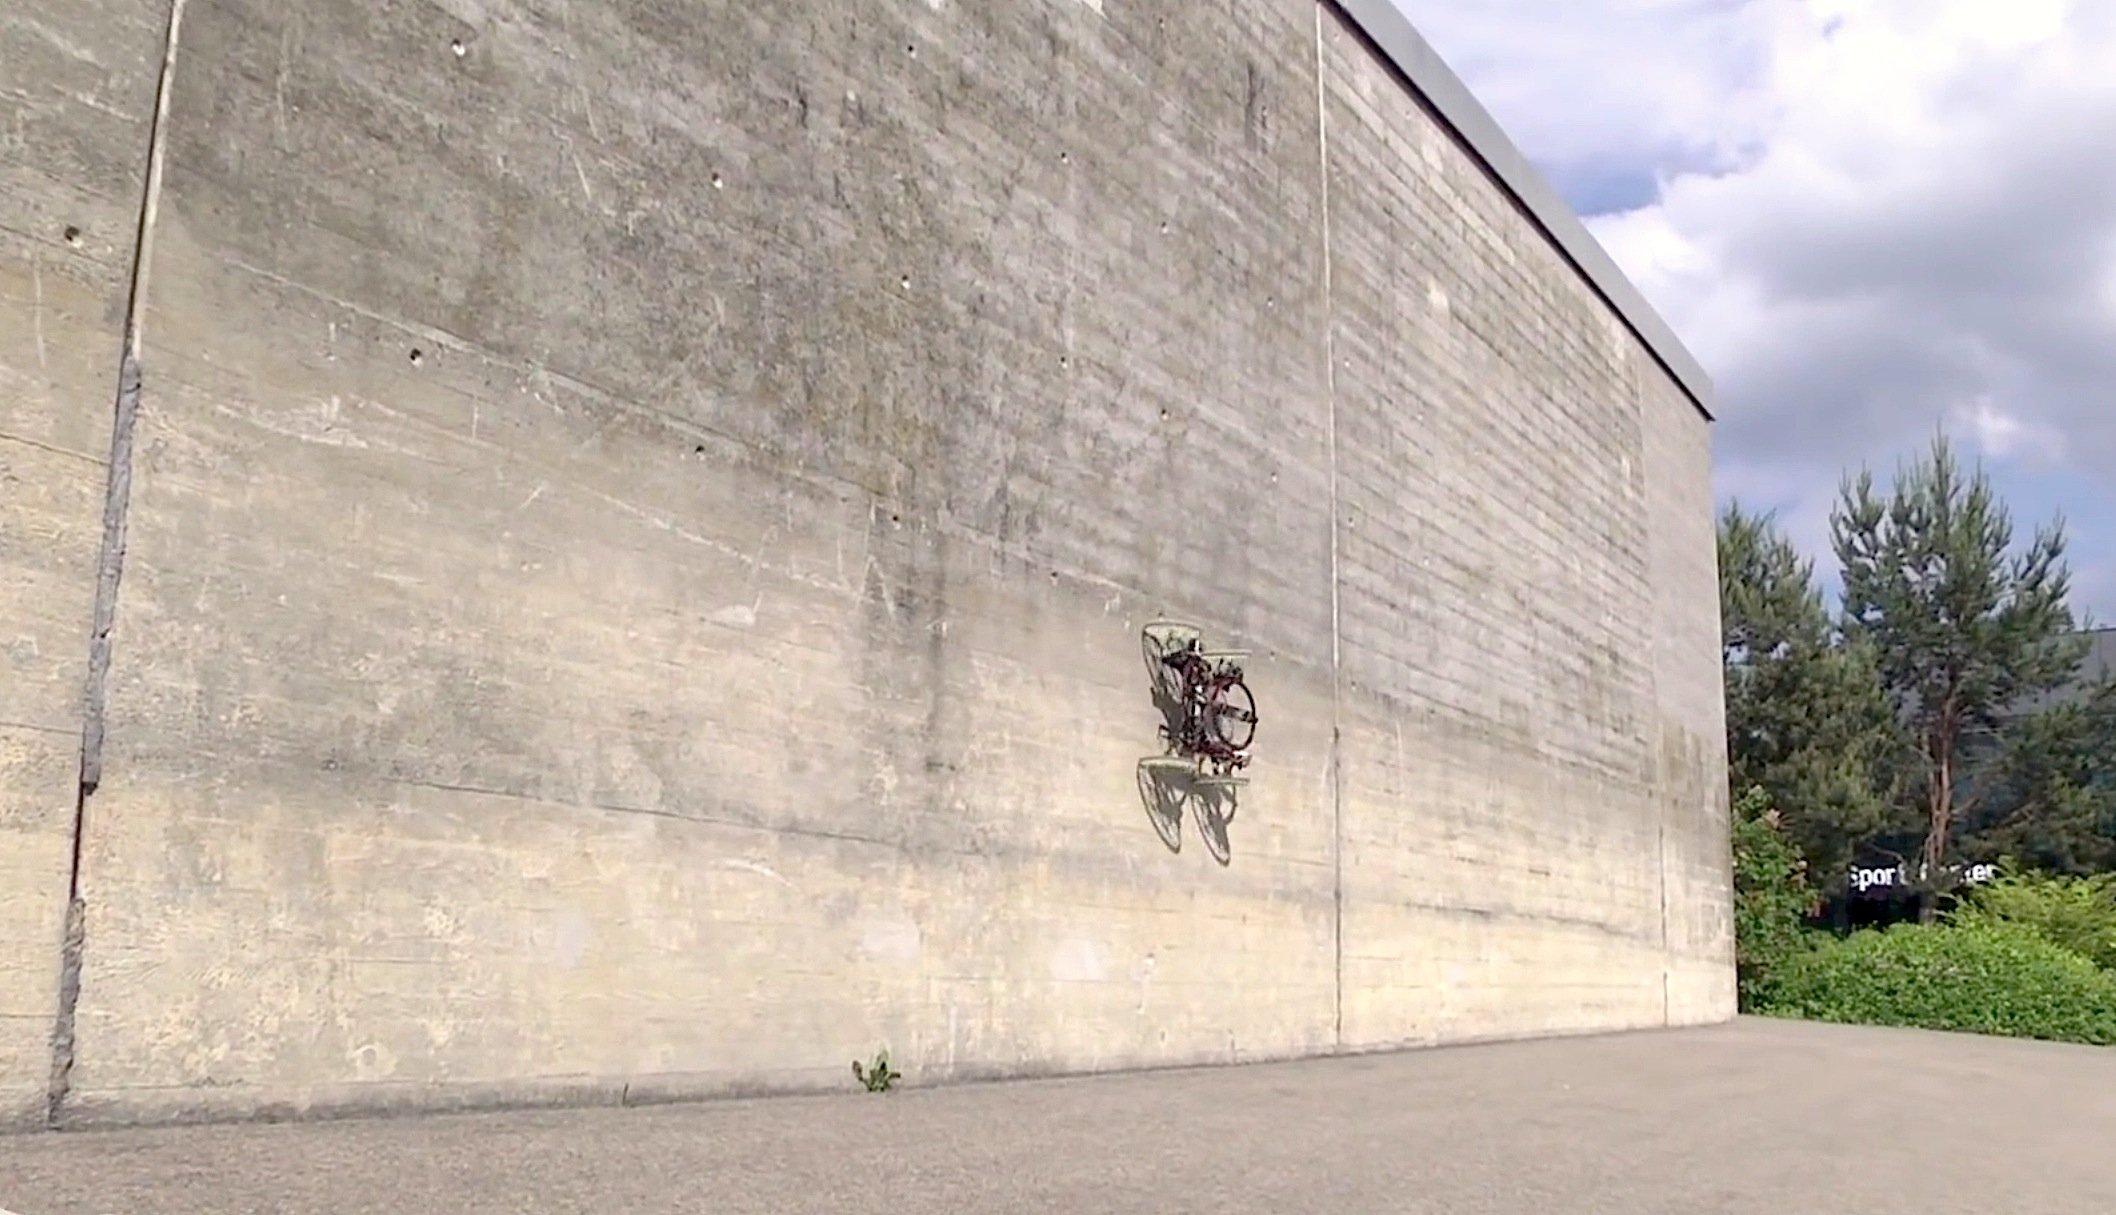 Auch Hindernisse an der Wand wie Balken kann VertiGo mühelos überwinden. Theoretisch kann VertiGo dank der beiden Propeller sogar an der Decke entlang fahren.